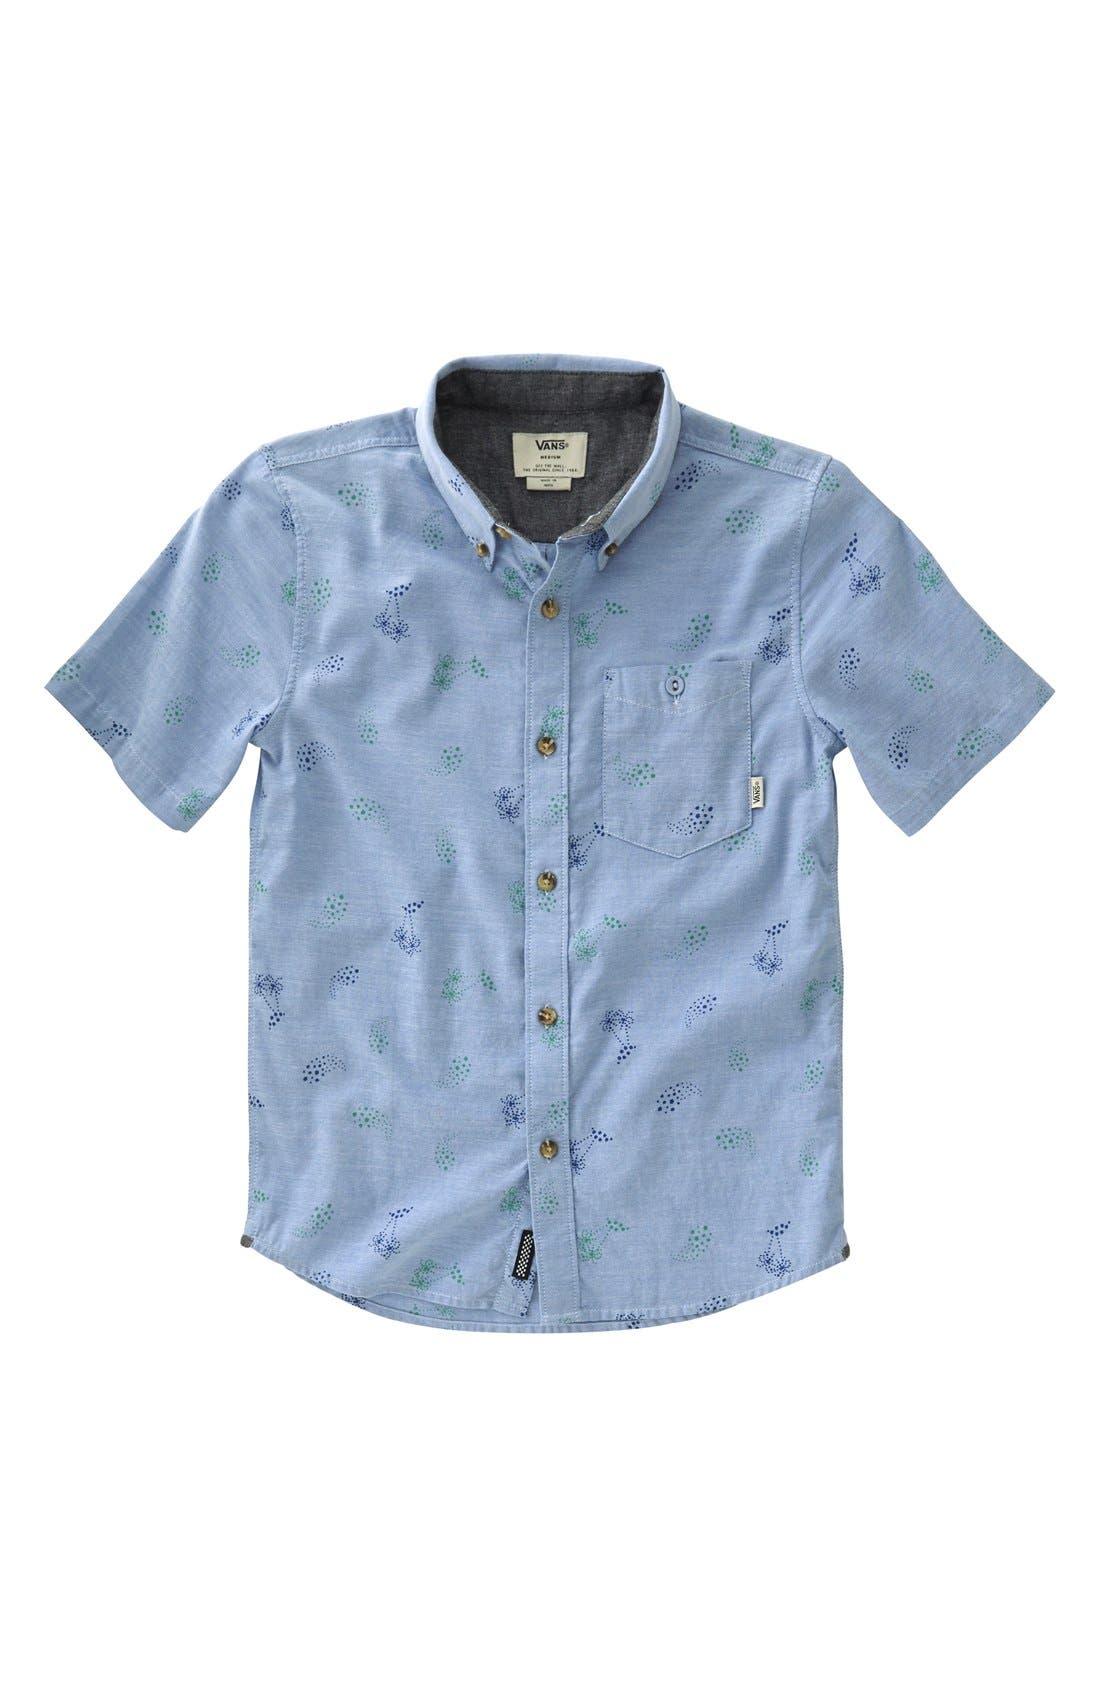 Main Image - Vans 'Baines' Print Oxford Woven Shirt (Big Boys)